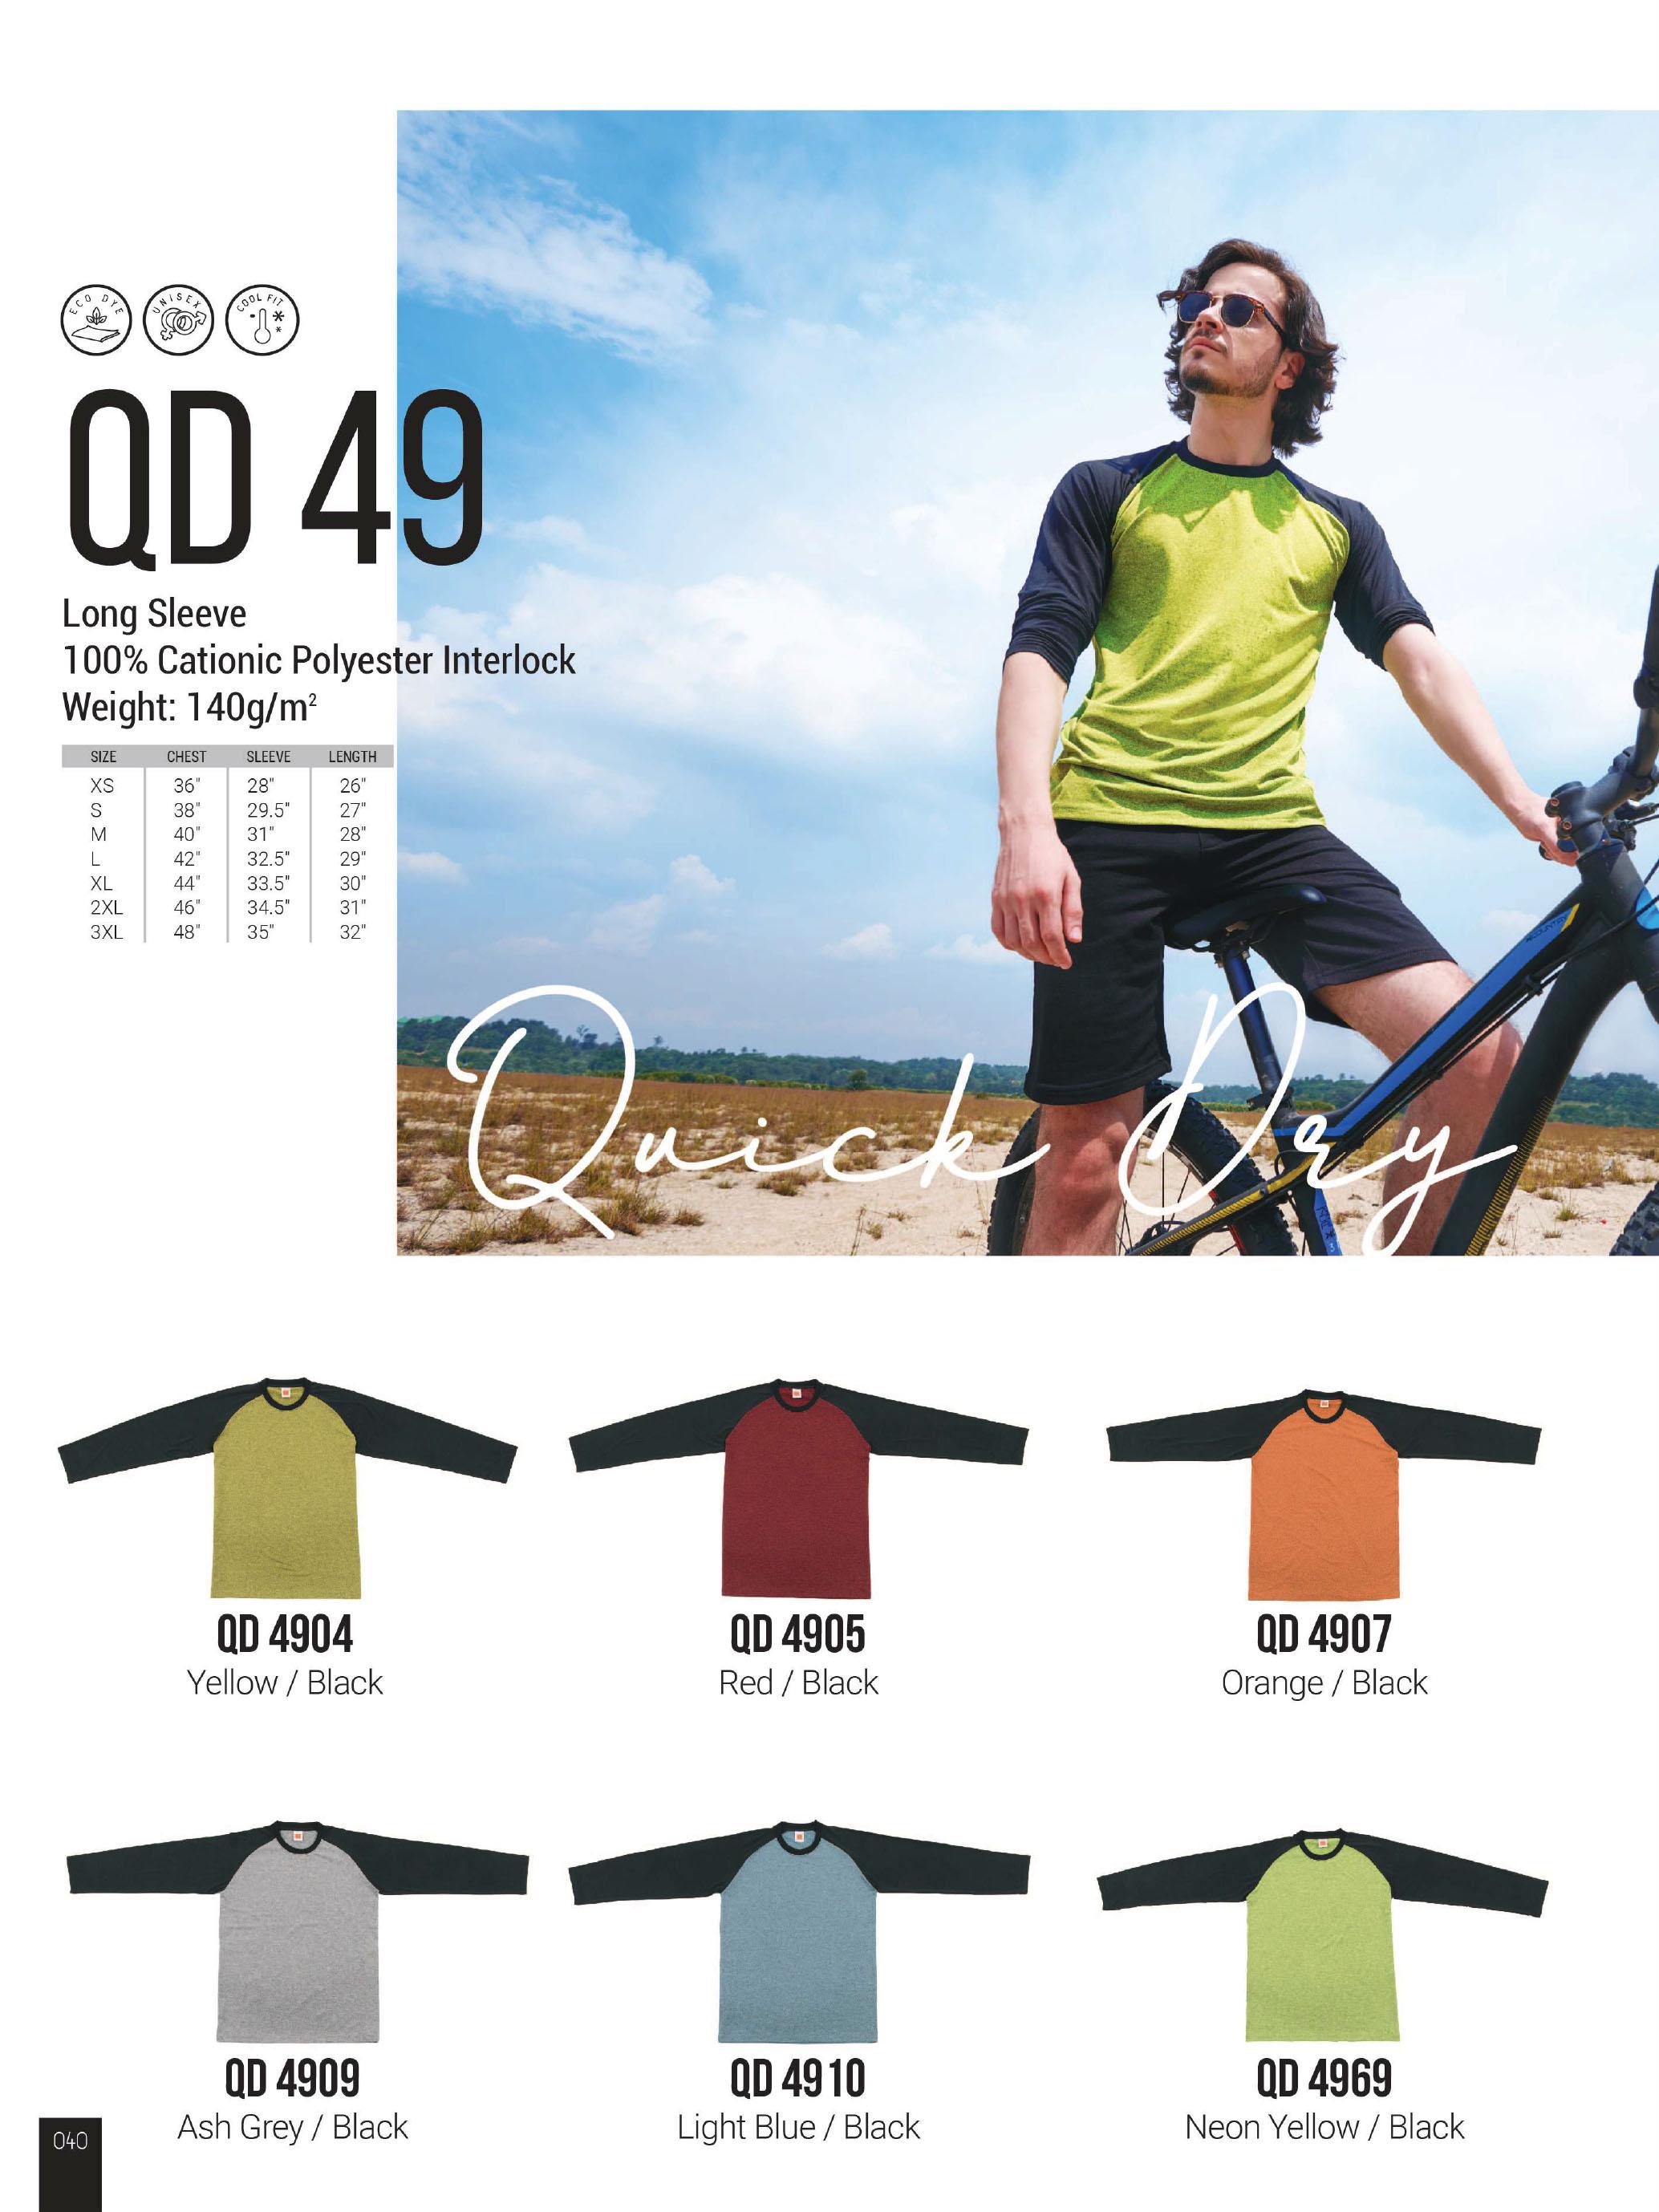 Oren Sport Catalogue 2021-42-QuickDry